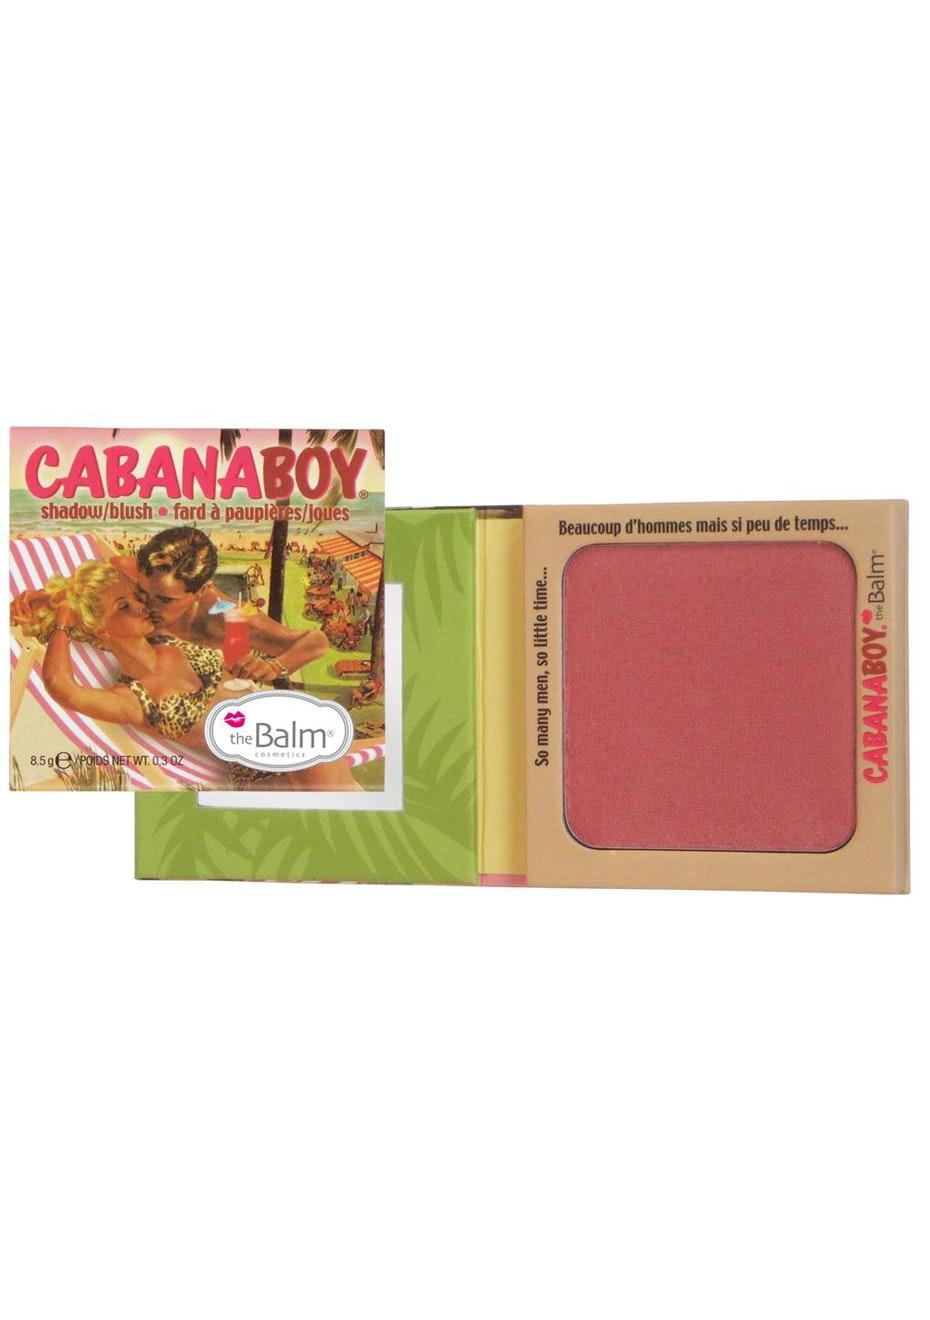 theBalm Cabanaboy Shadow Blush